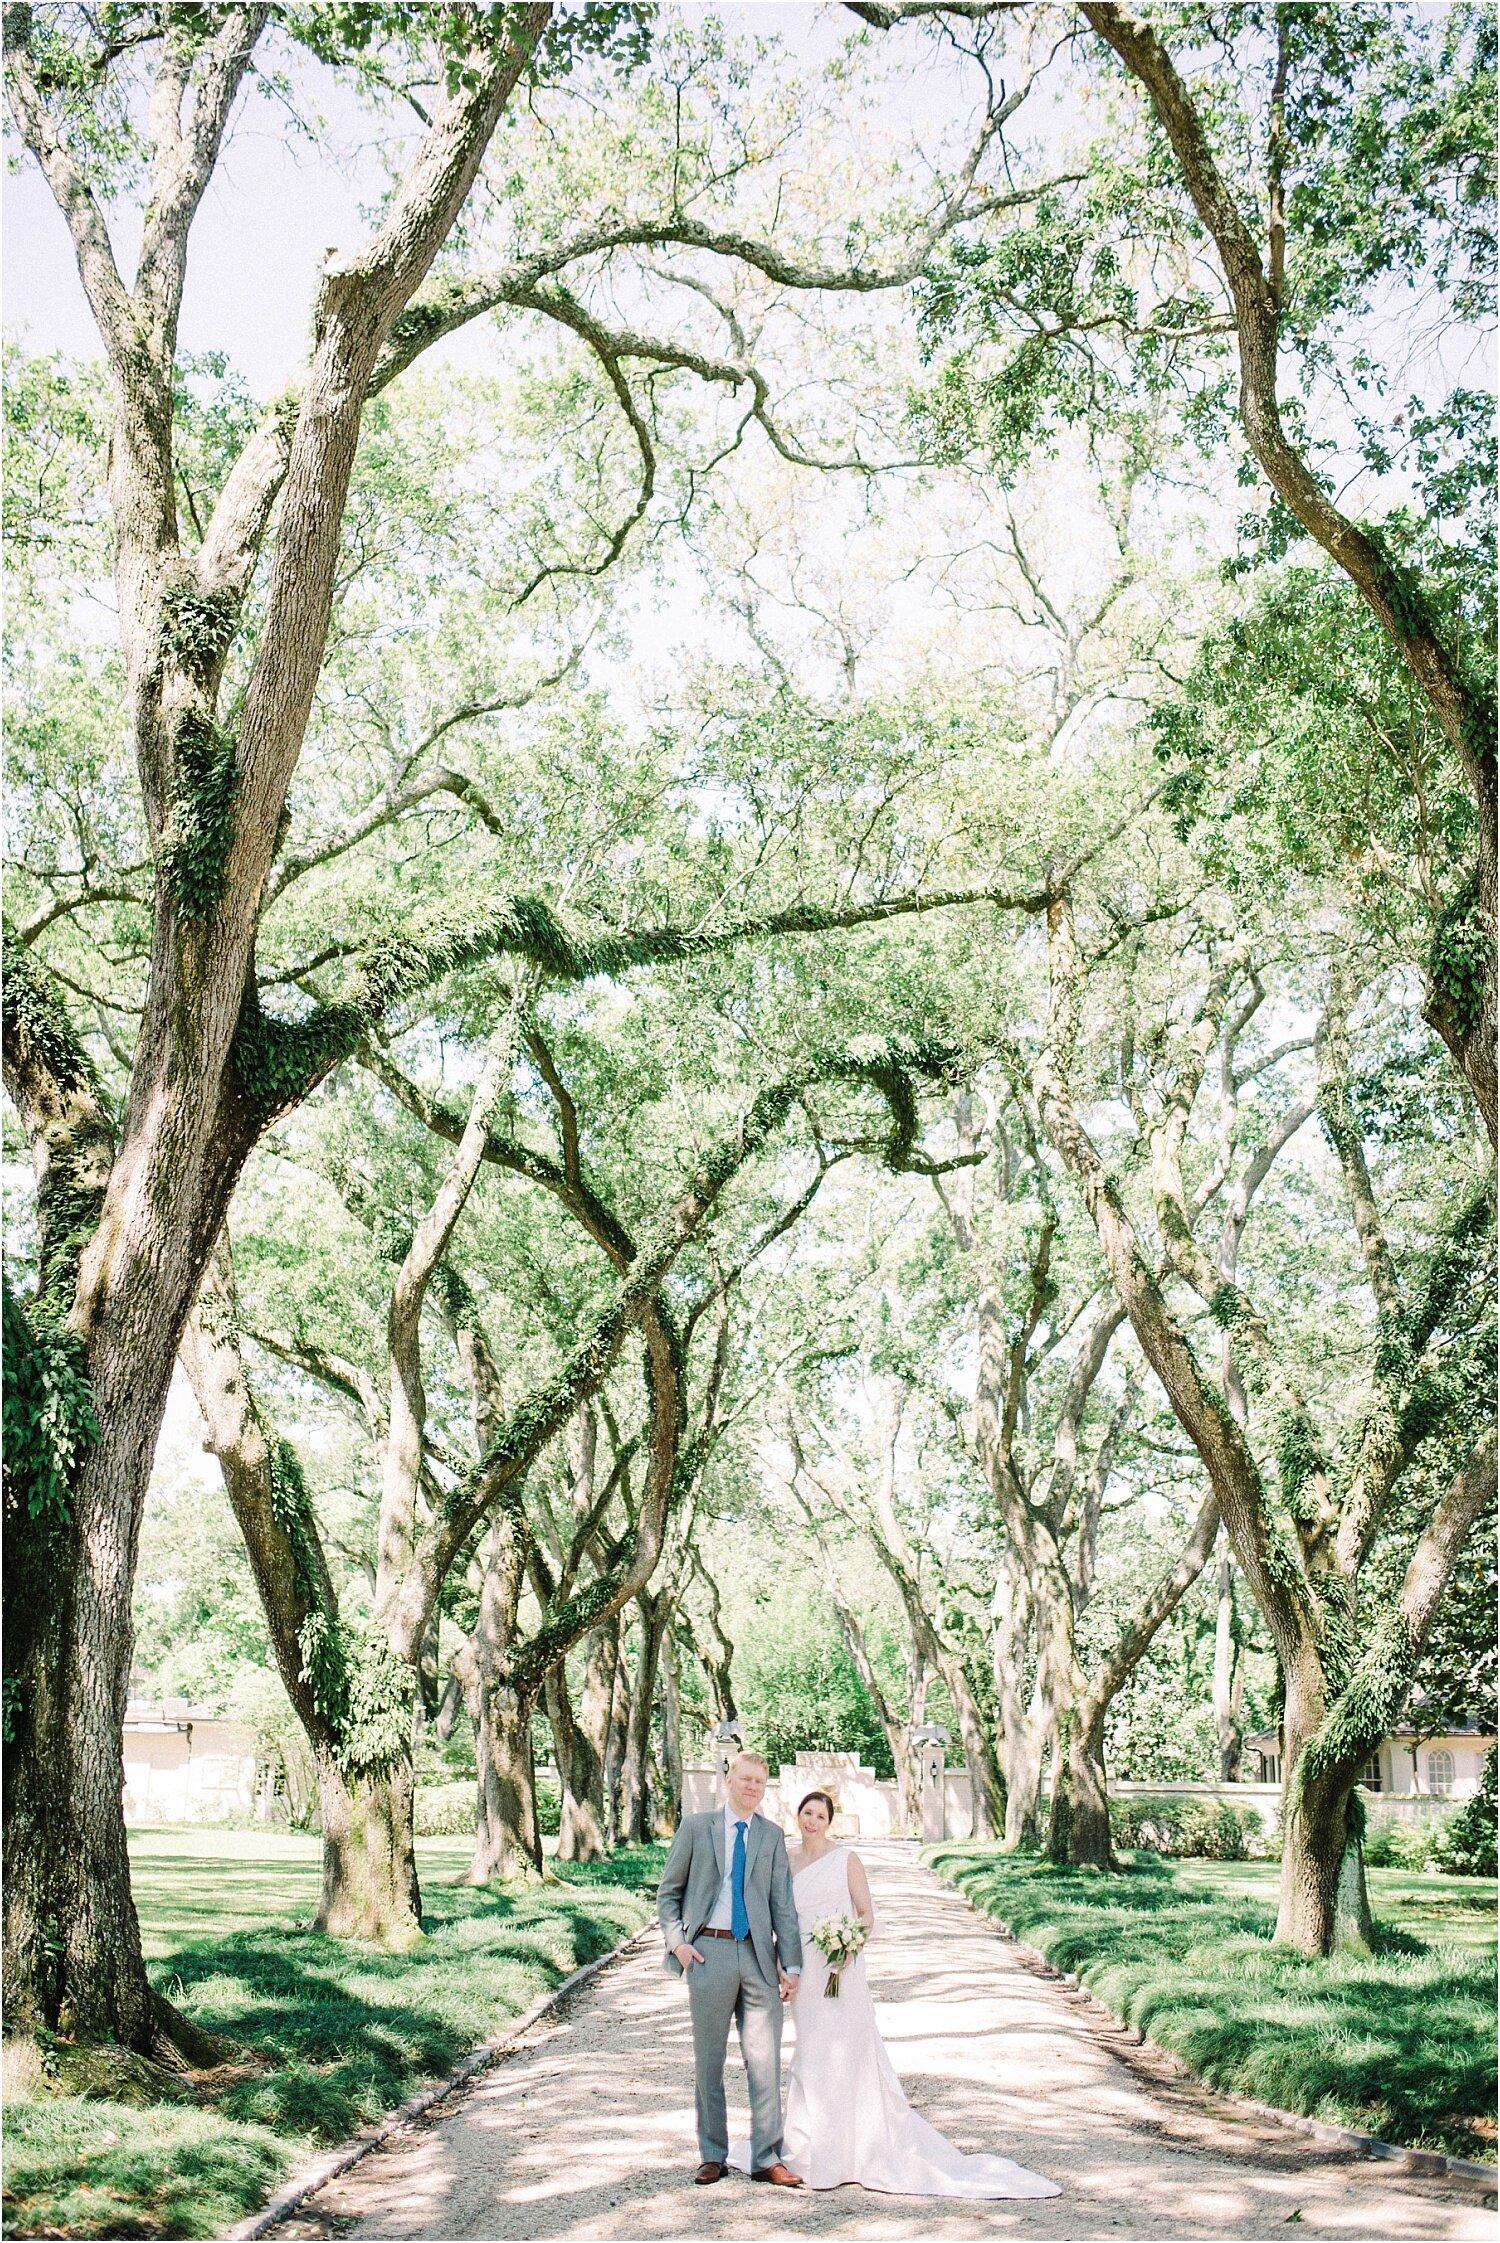 Heather + Scott-Longue-Vue-house-and-gardens-black-tie-wedding-photos_Gabby Chapin_Print_0068_BLOG.jpg